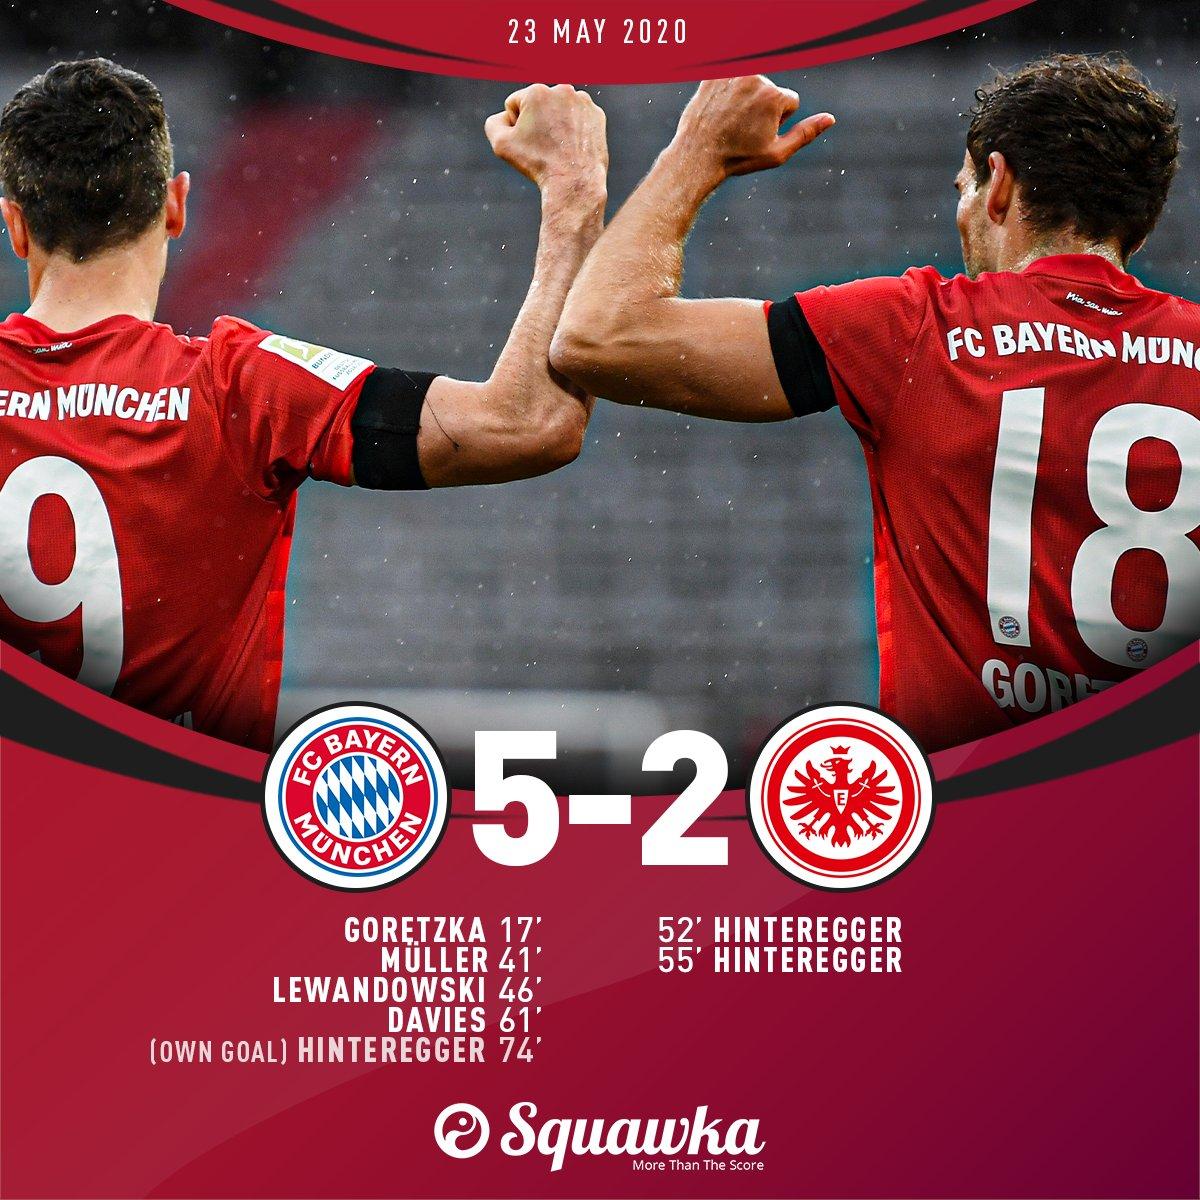 17: Bayern 1-0 Eintracht 41: Bayern 2-0 Eintracht 46: Bayern 3-0 Eintracht 52: Bayern 3-1 Eintracht 55: Bayern 3-2 Eintracht 61: Bayern 4-2 Eintracht 74: Bayern 5-2 Eintracht More, please. 😍